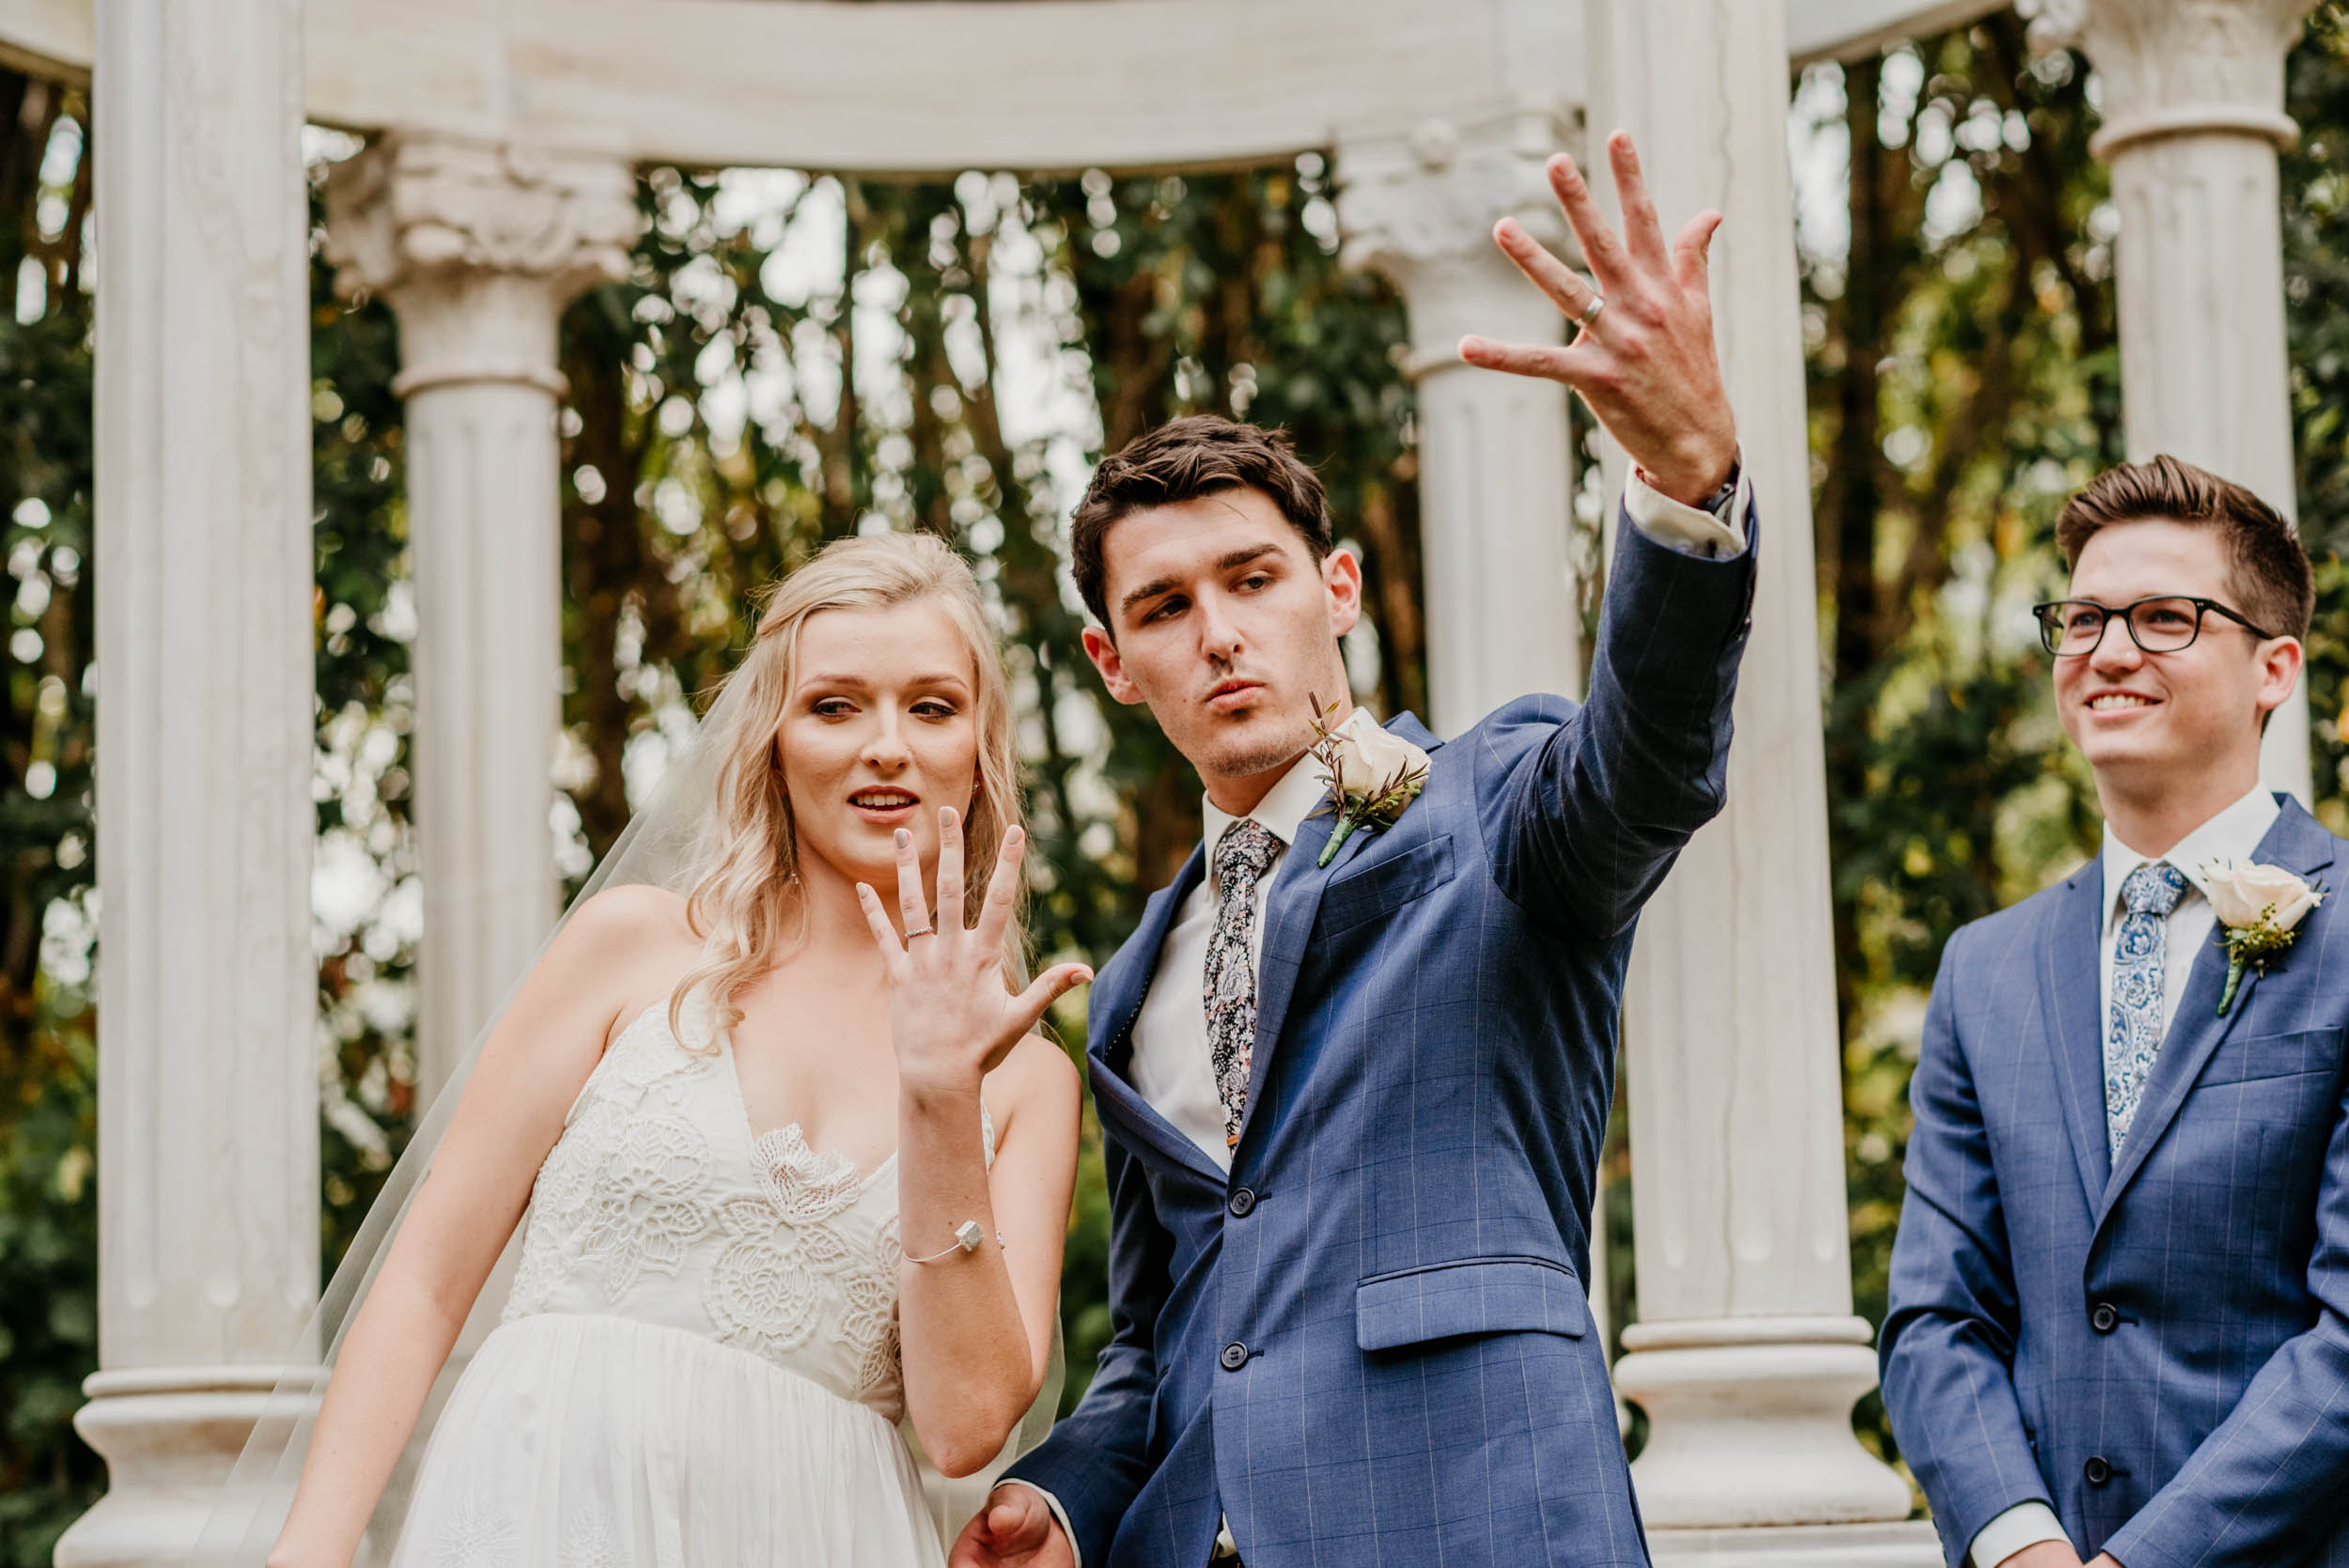 The Raw Photographer - Cairns Wedding Photographer - Laloli - Cairns Garden Wedding - Wedding Dress-45.jpg